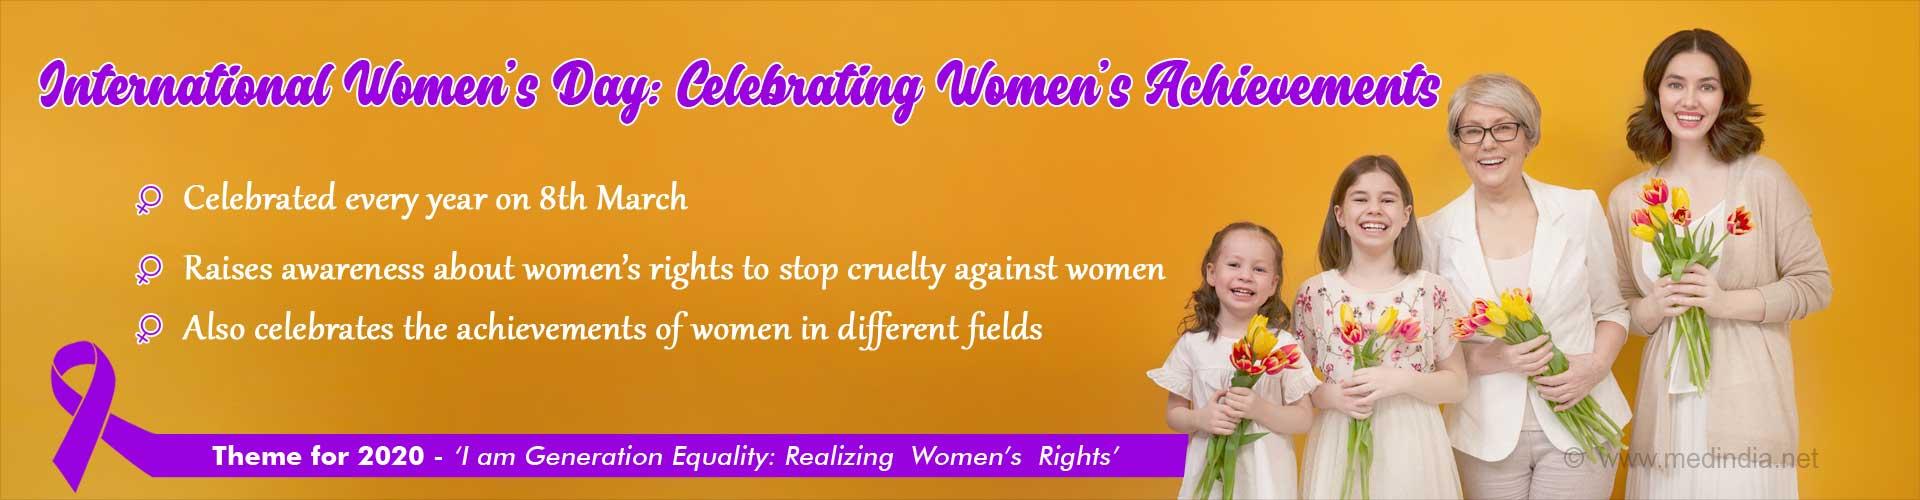 International Women's Day: Let's Build a Gender Equal World